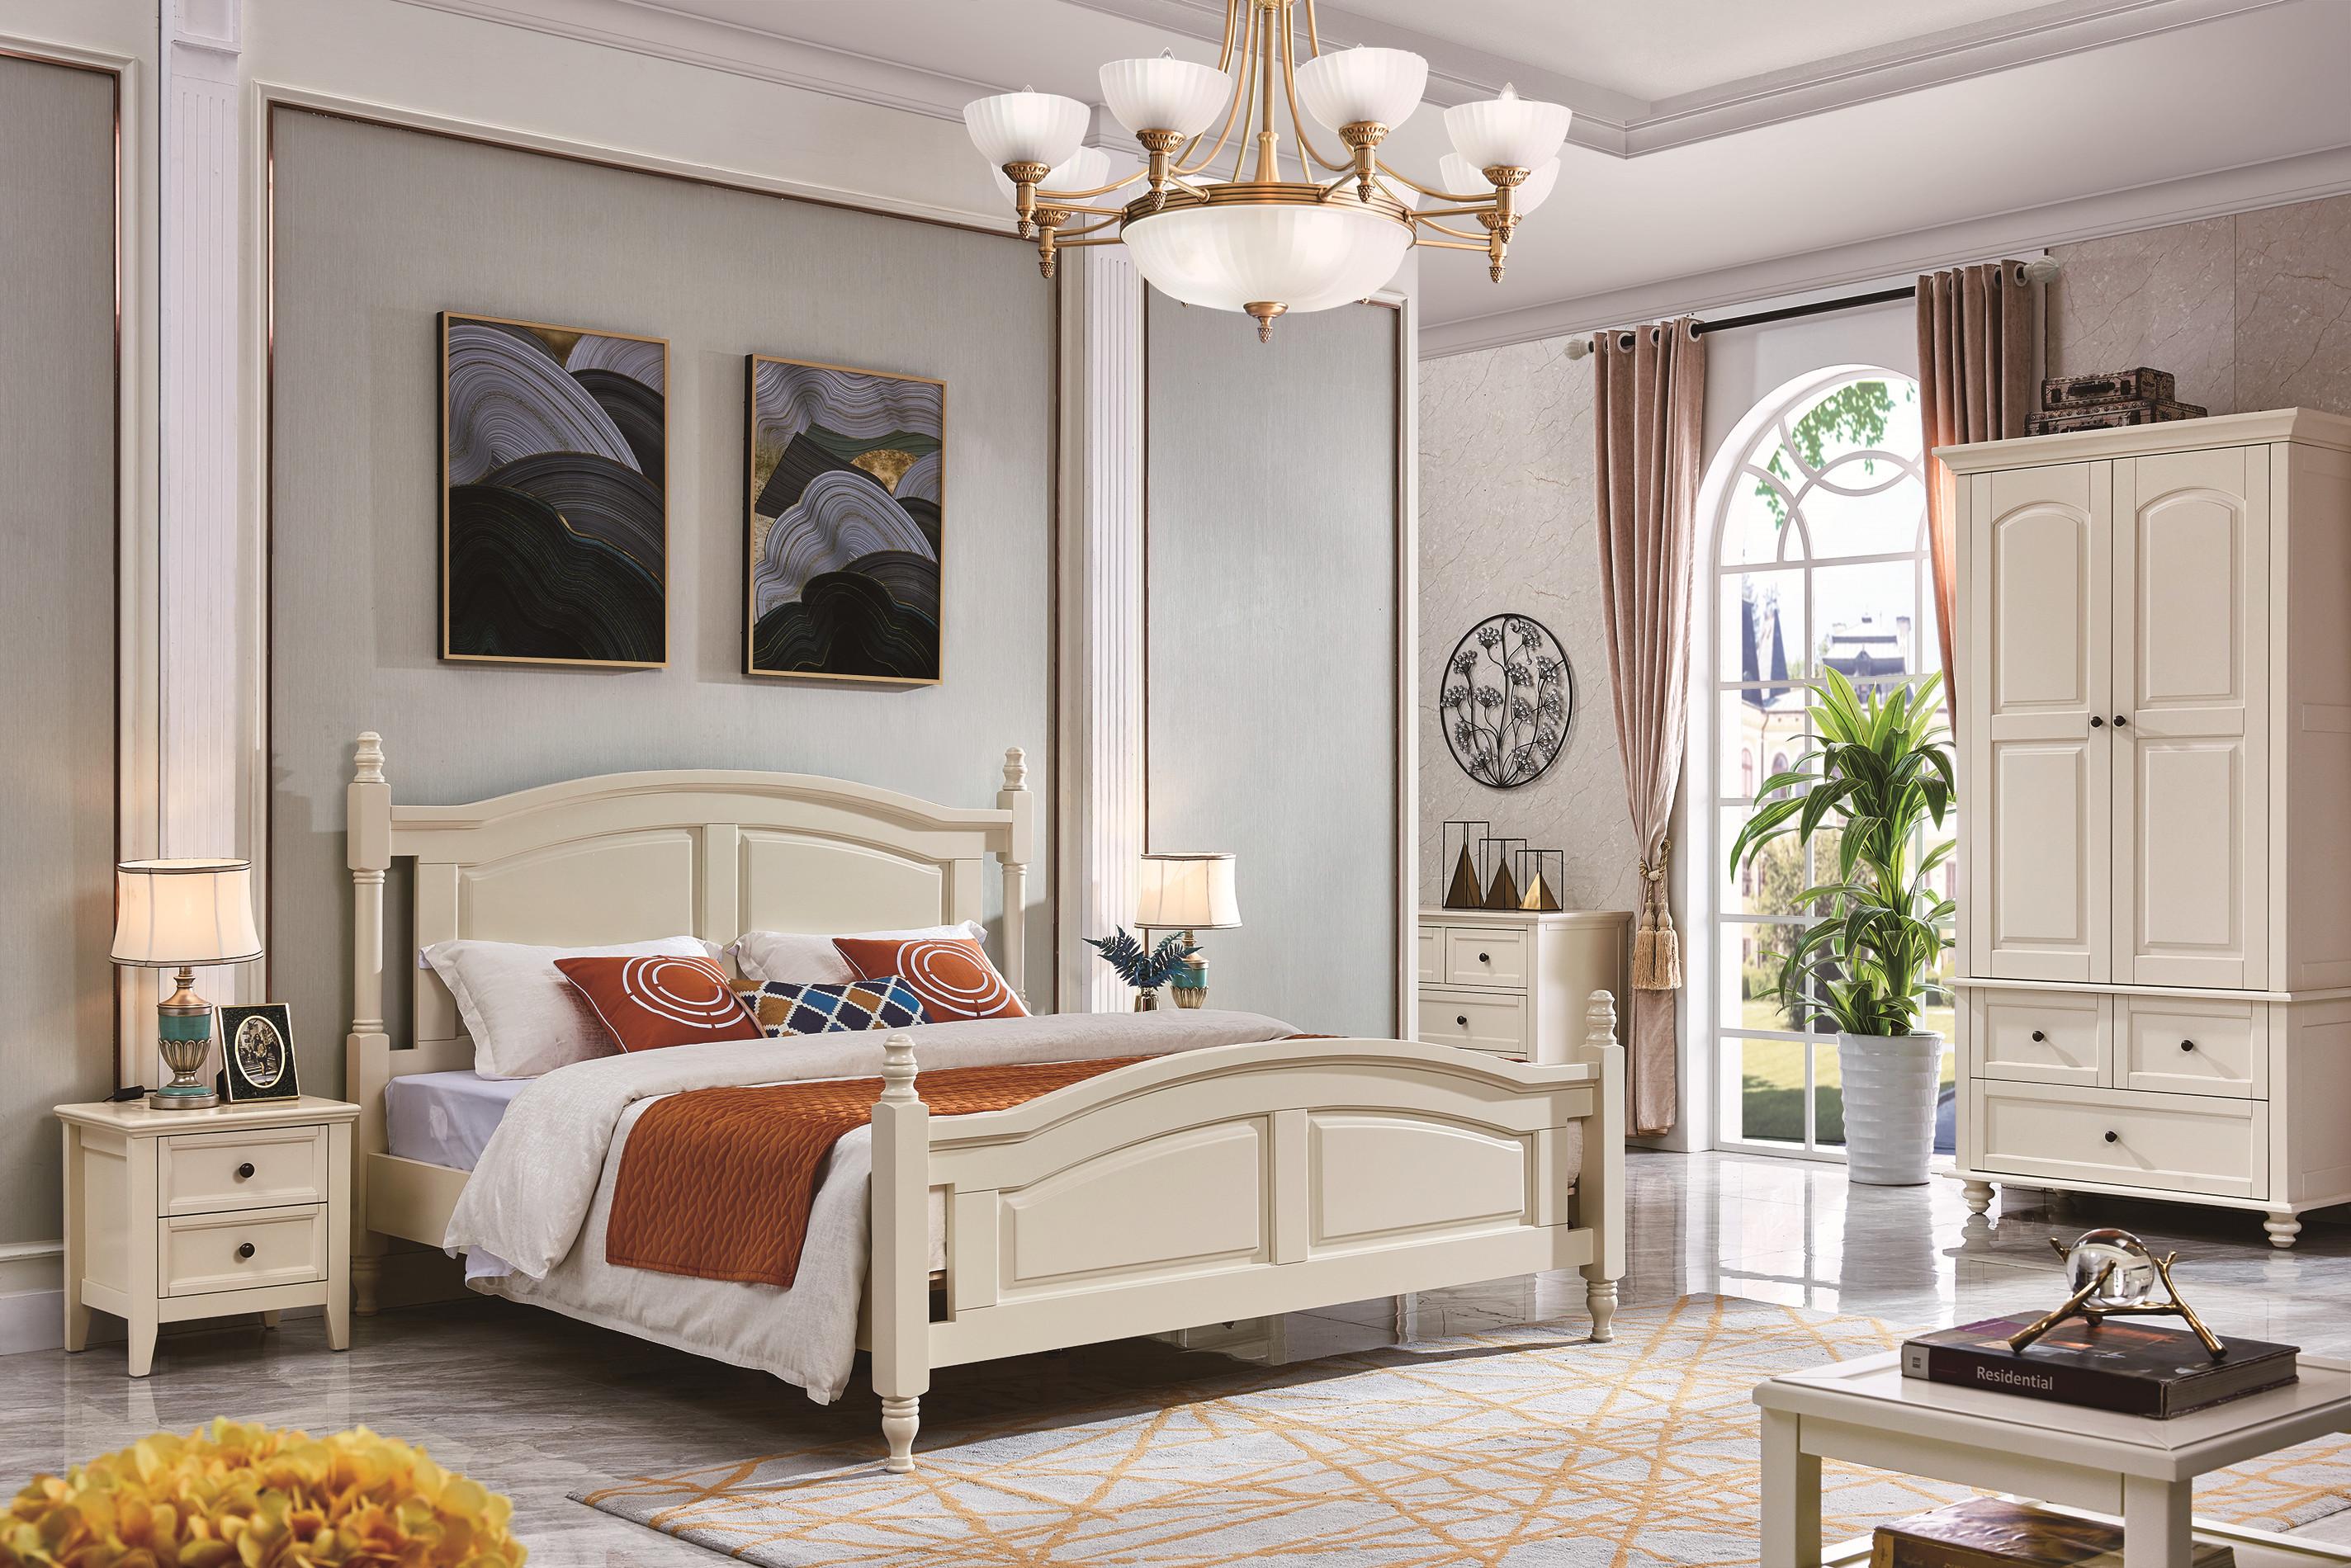 Full Oak Solid Wood Home Furniture New King Bed Designs Model